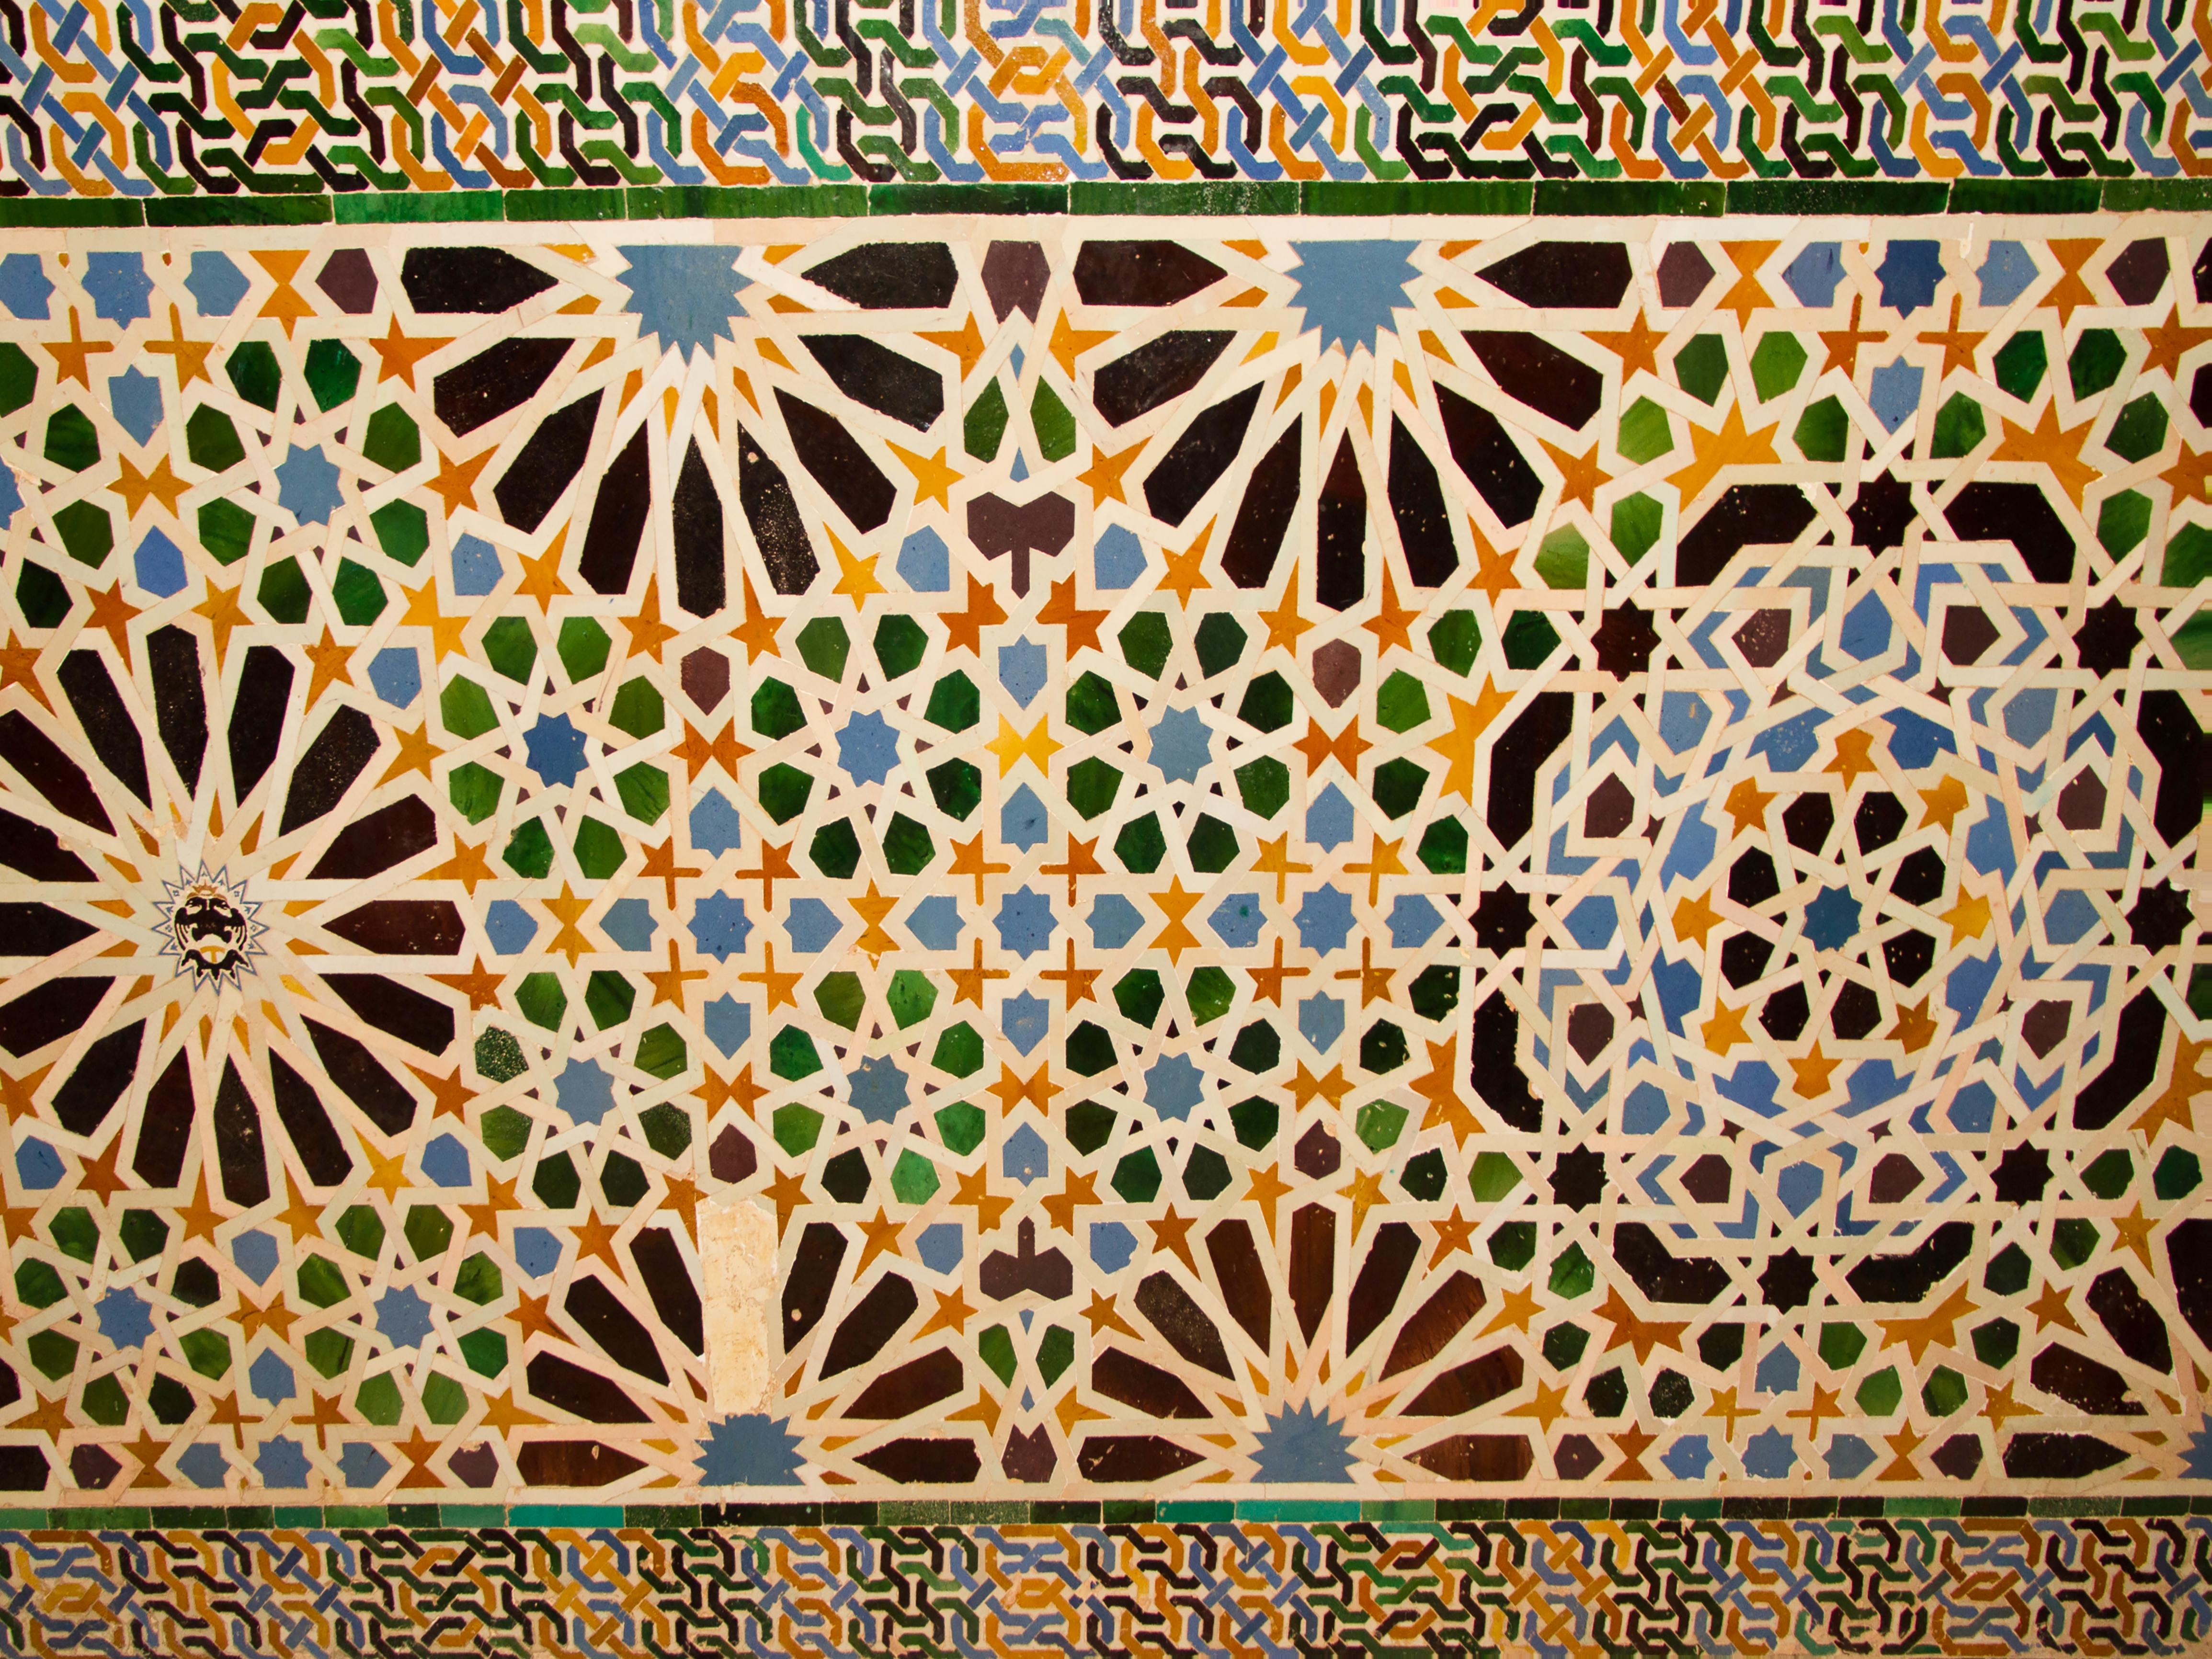 © Gilles Nicoud-Alhambra-IMG_8693b